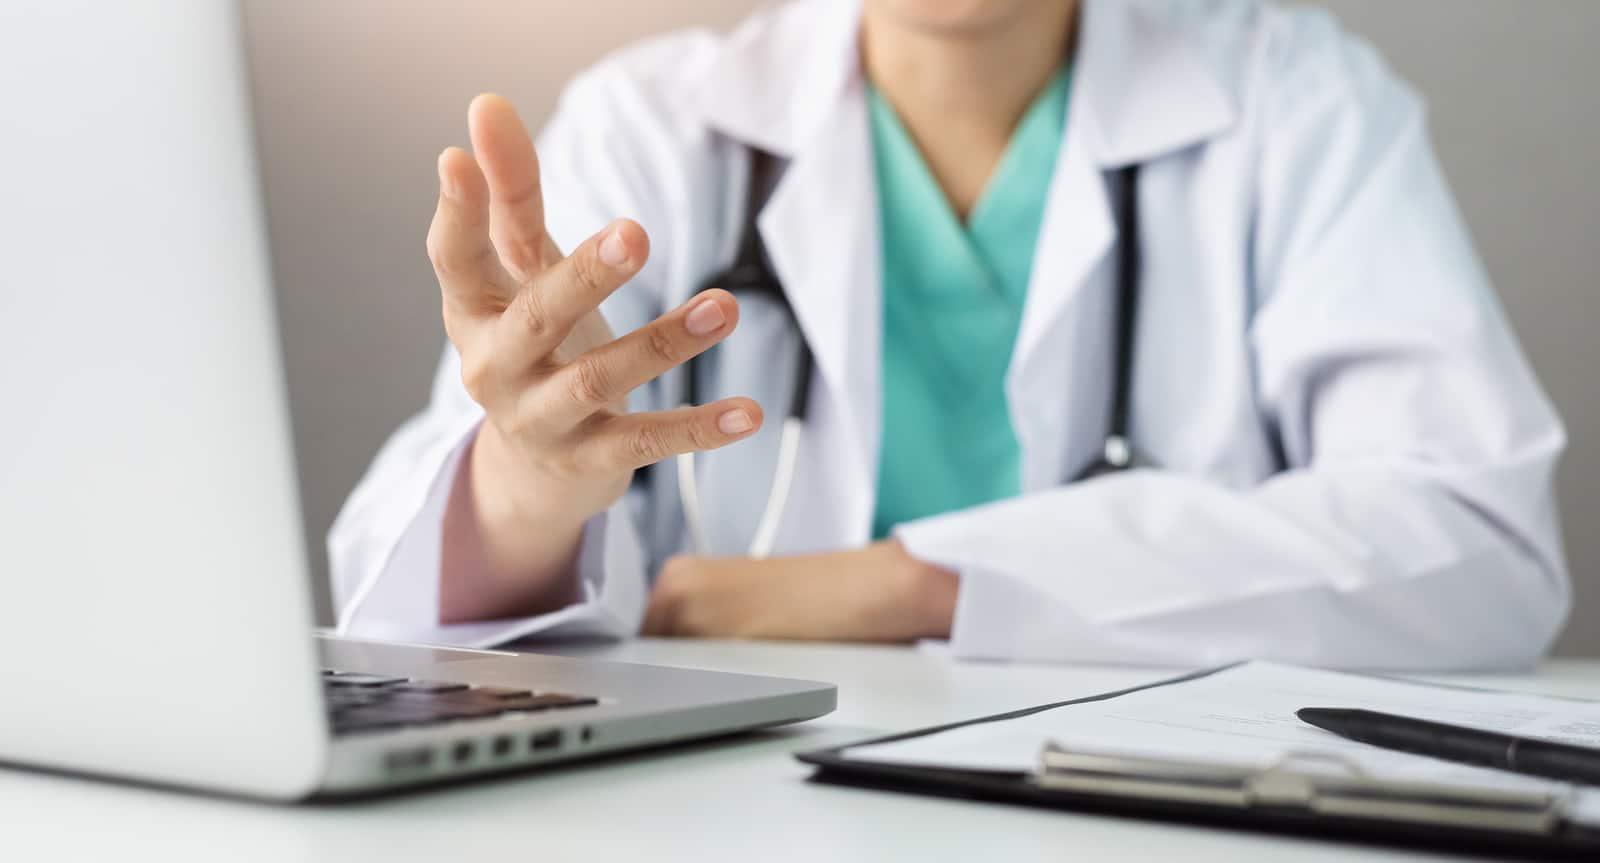 gerenciamento-de-pacientes-cronicos